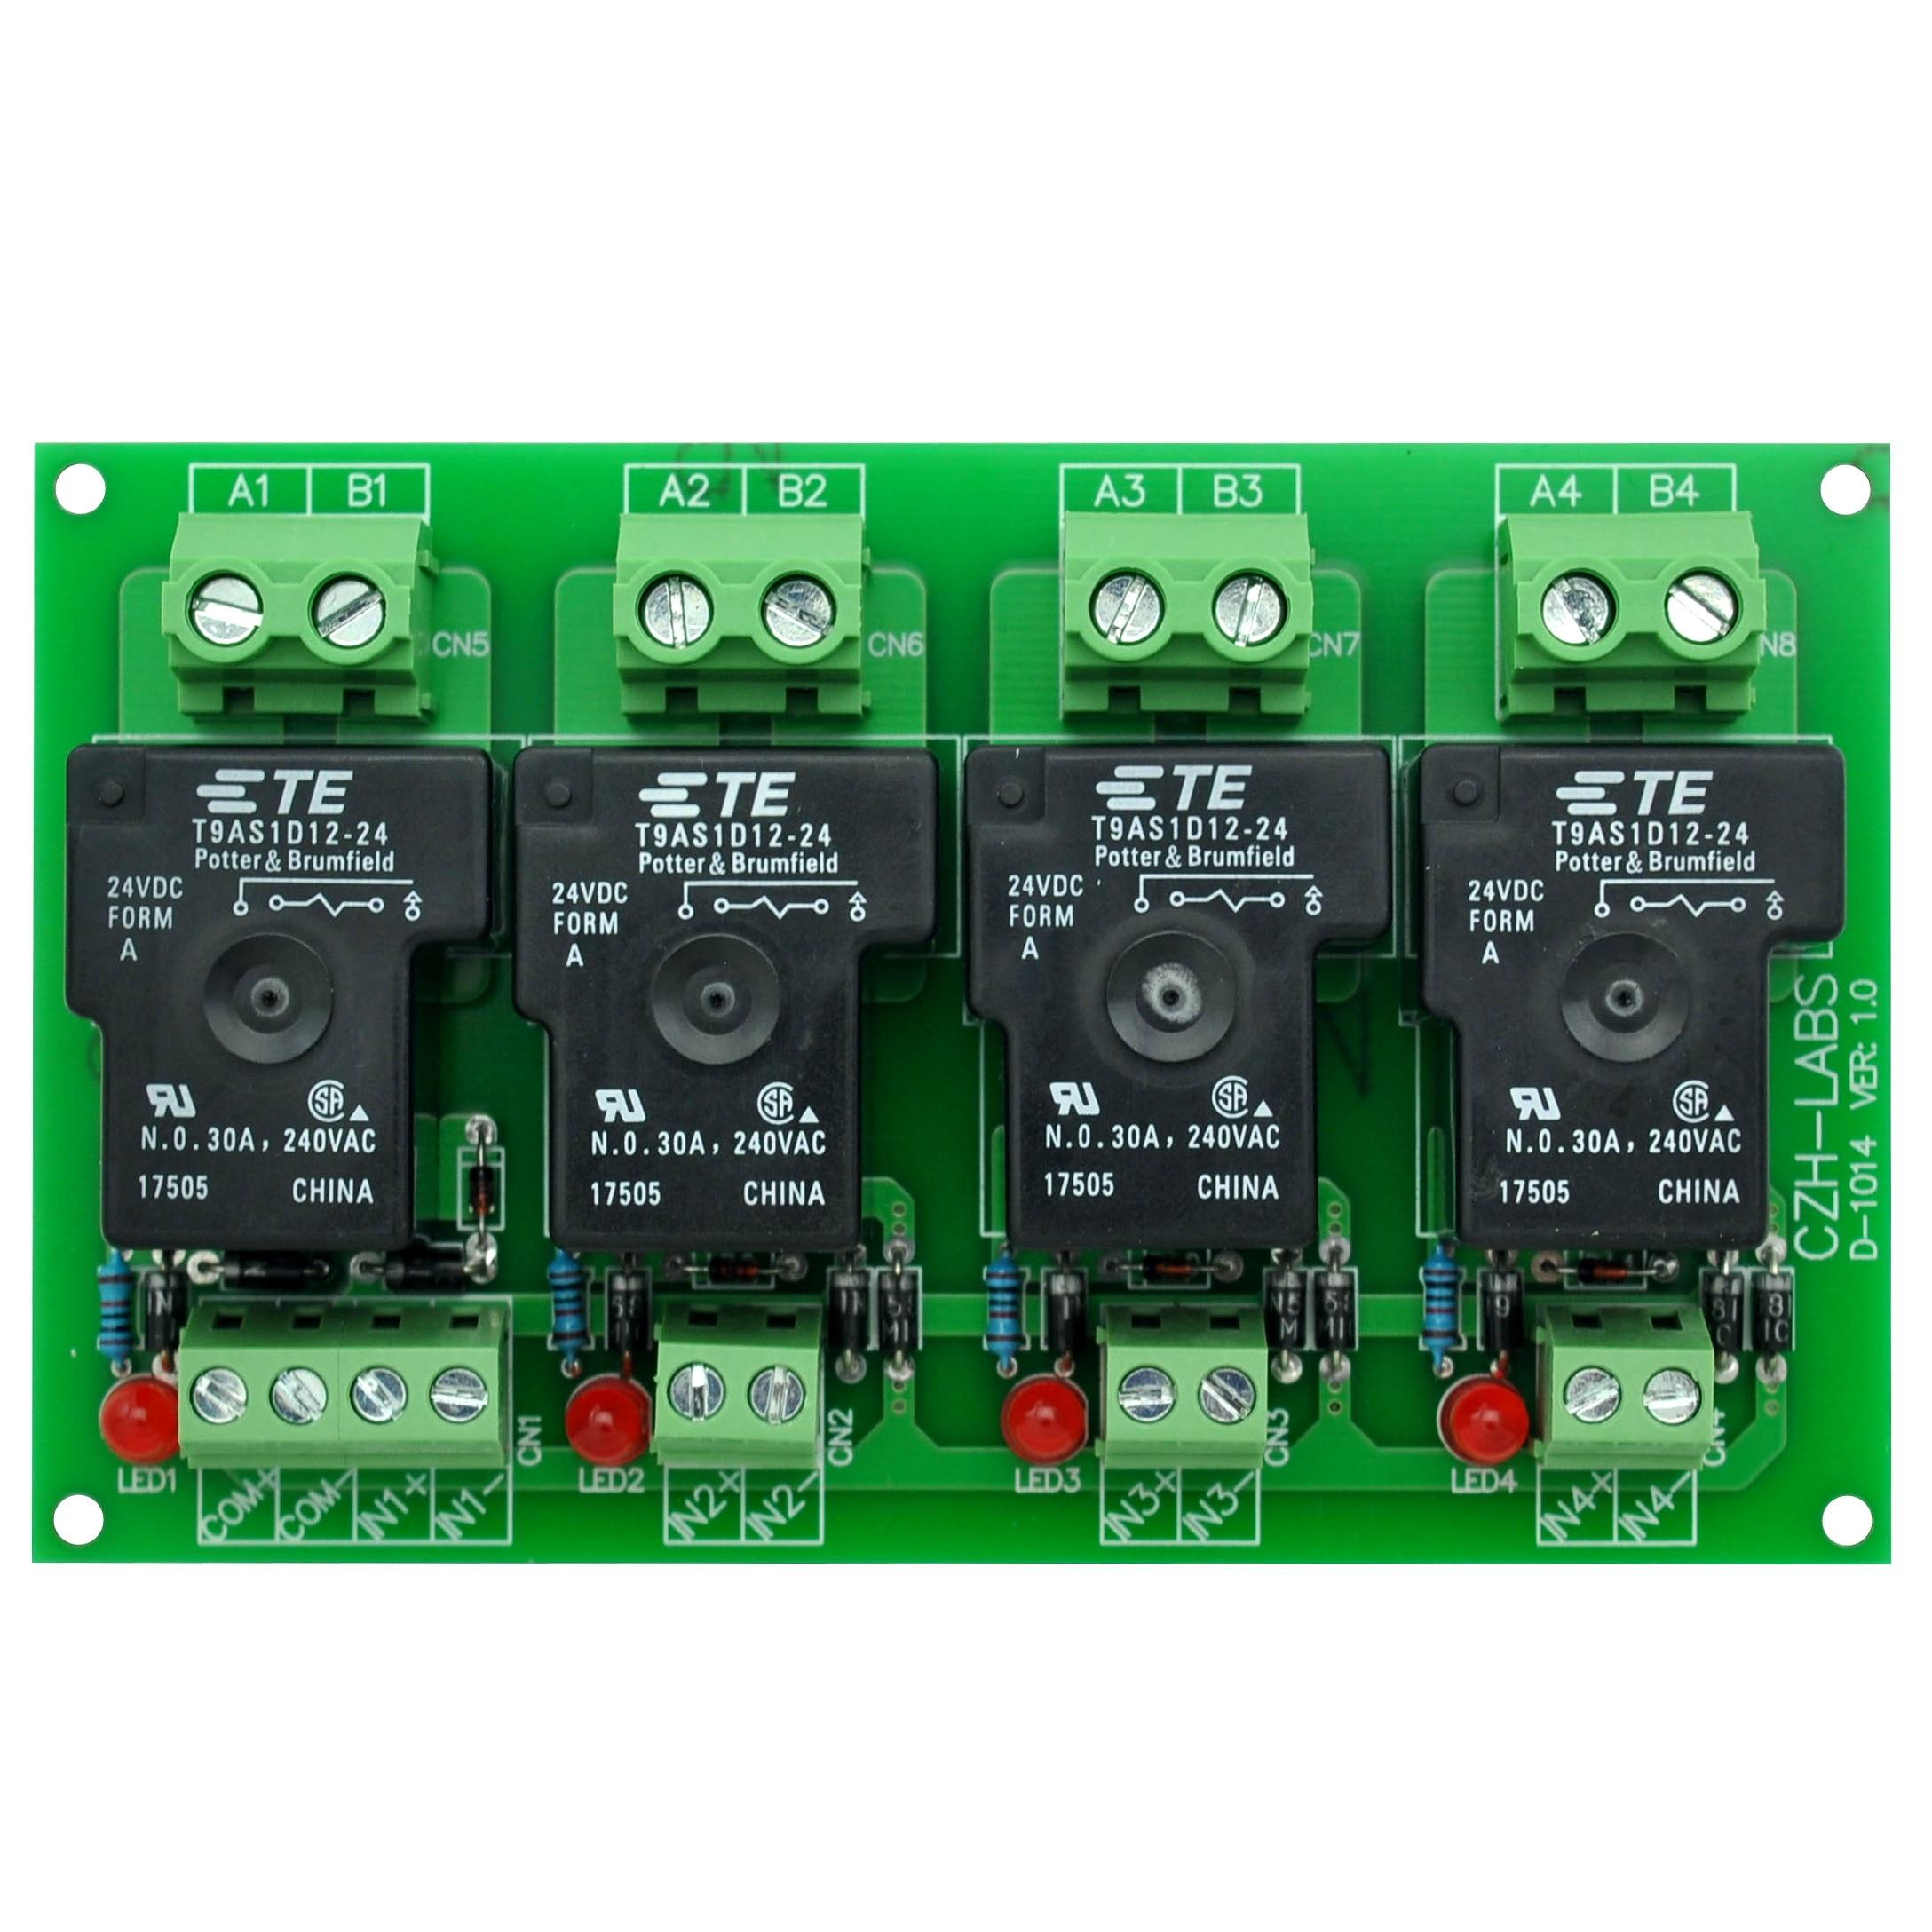 CZH-Labs 24V Passive 4 SPST-NO 30Amp Power Relay Module Board.